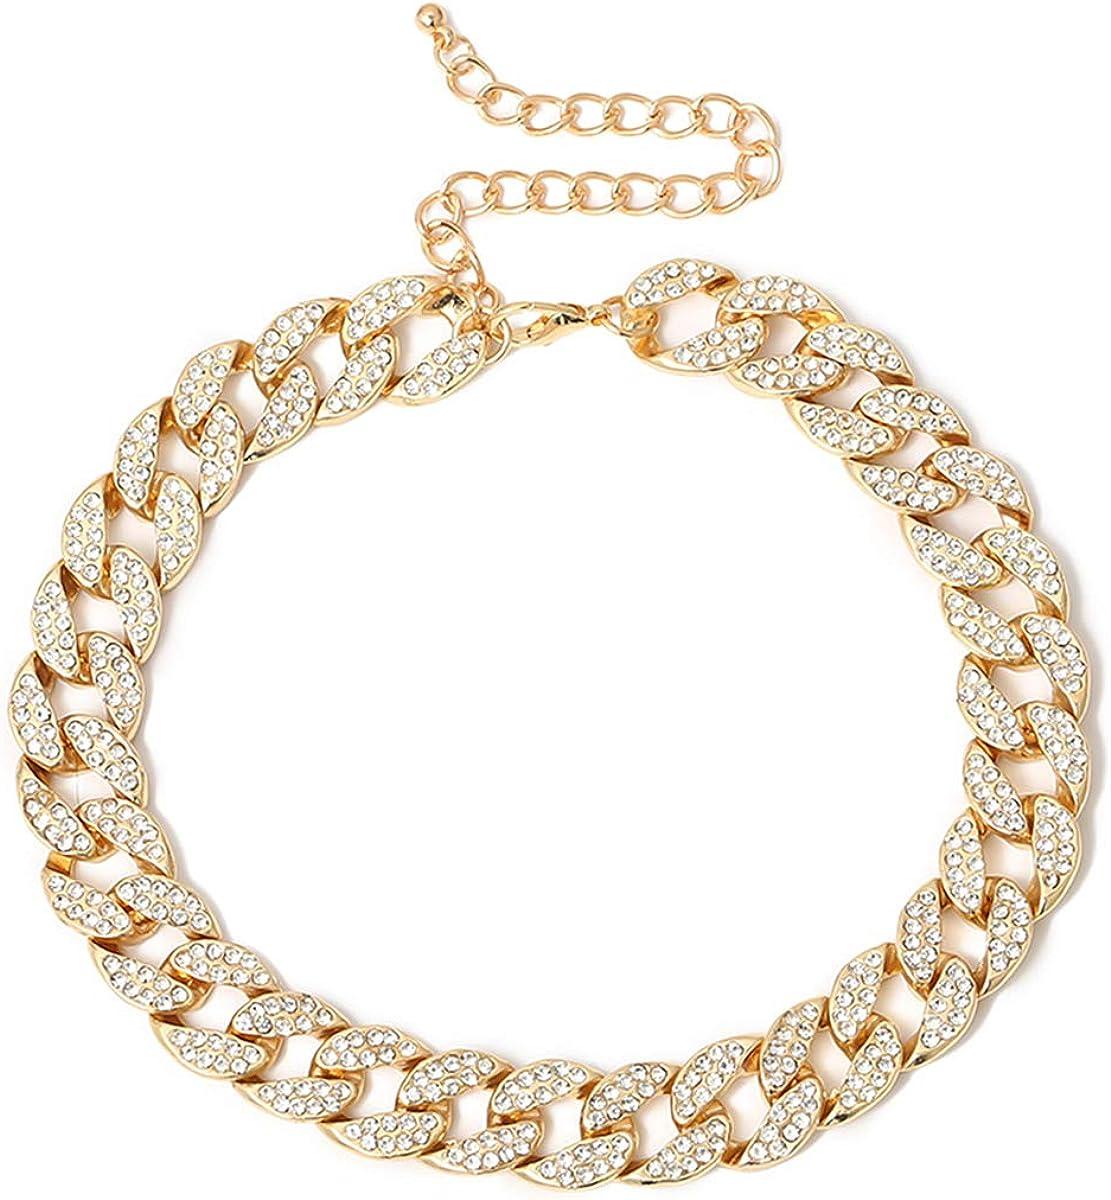 Ingemark Shiny CZ Rhinestone Curb Cuban Link Chain Choker for Women Unisex Cool Hip Hop Miami Cuban Diamond-Cut Chain Choker Necklace